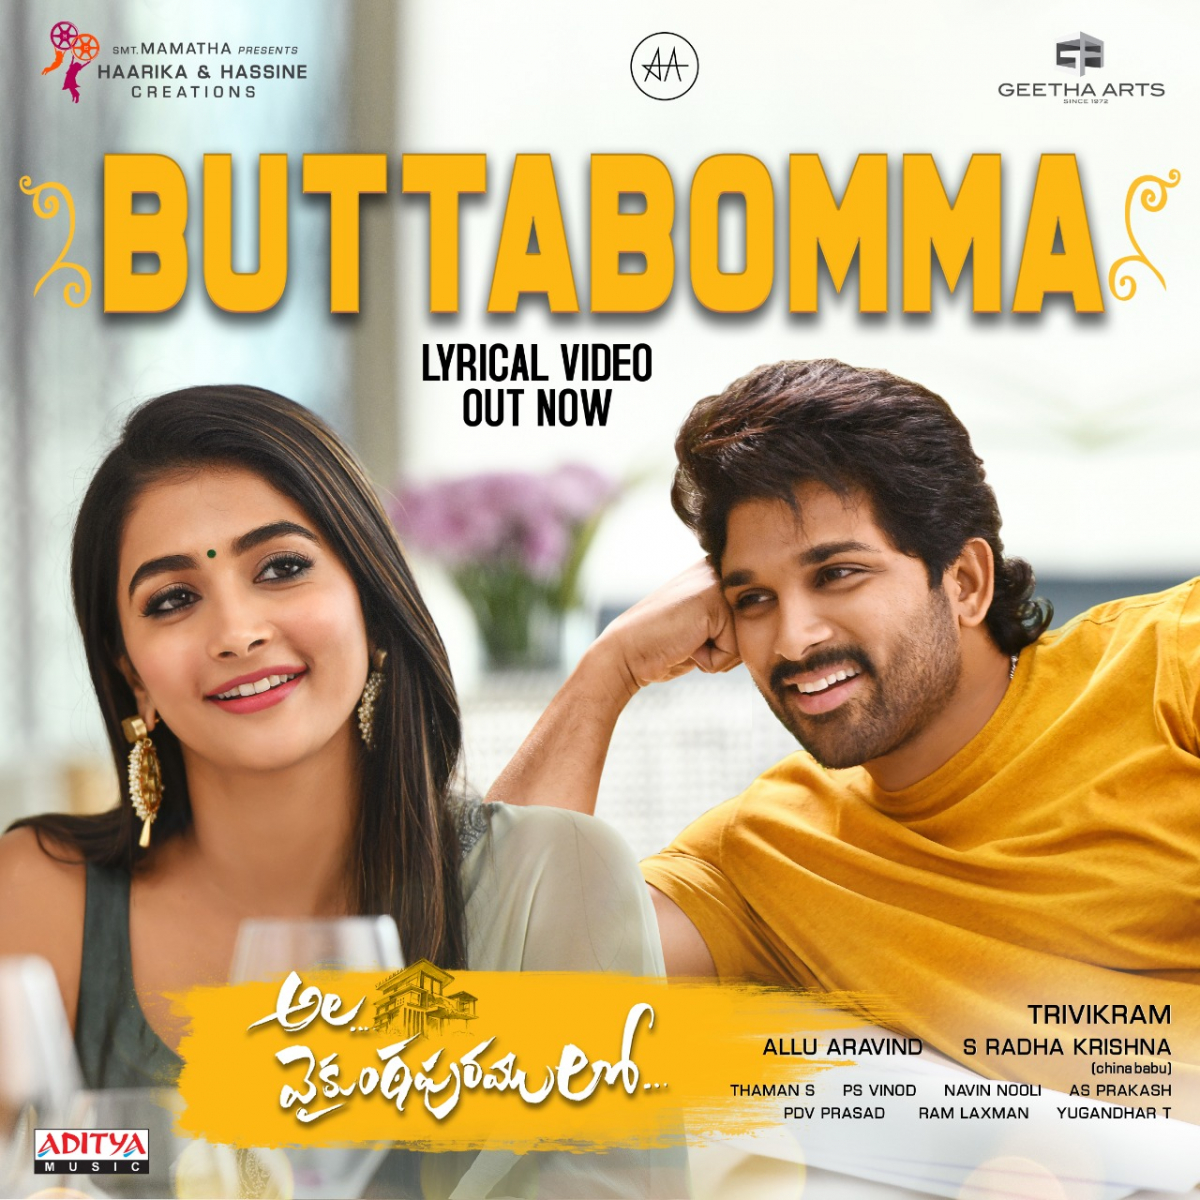 Allu Arjun, Pooja Hegde's song 'Botta Bomma' gets over 450 million views